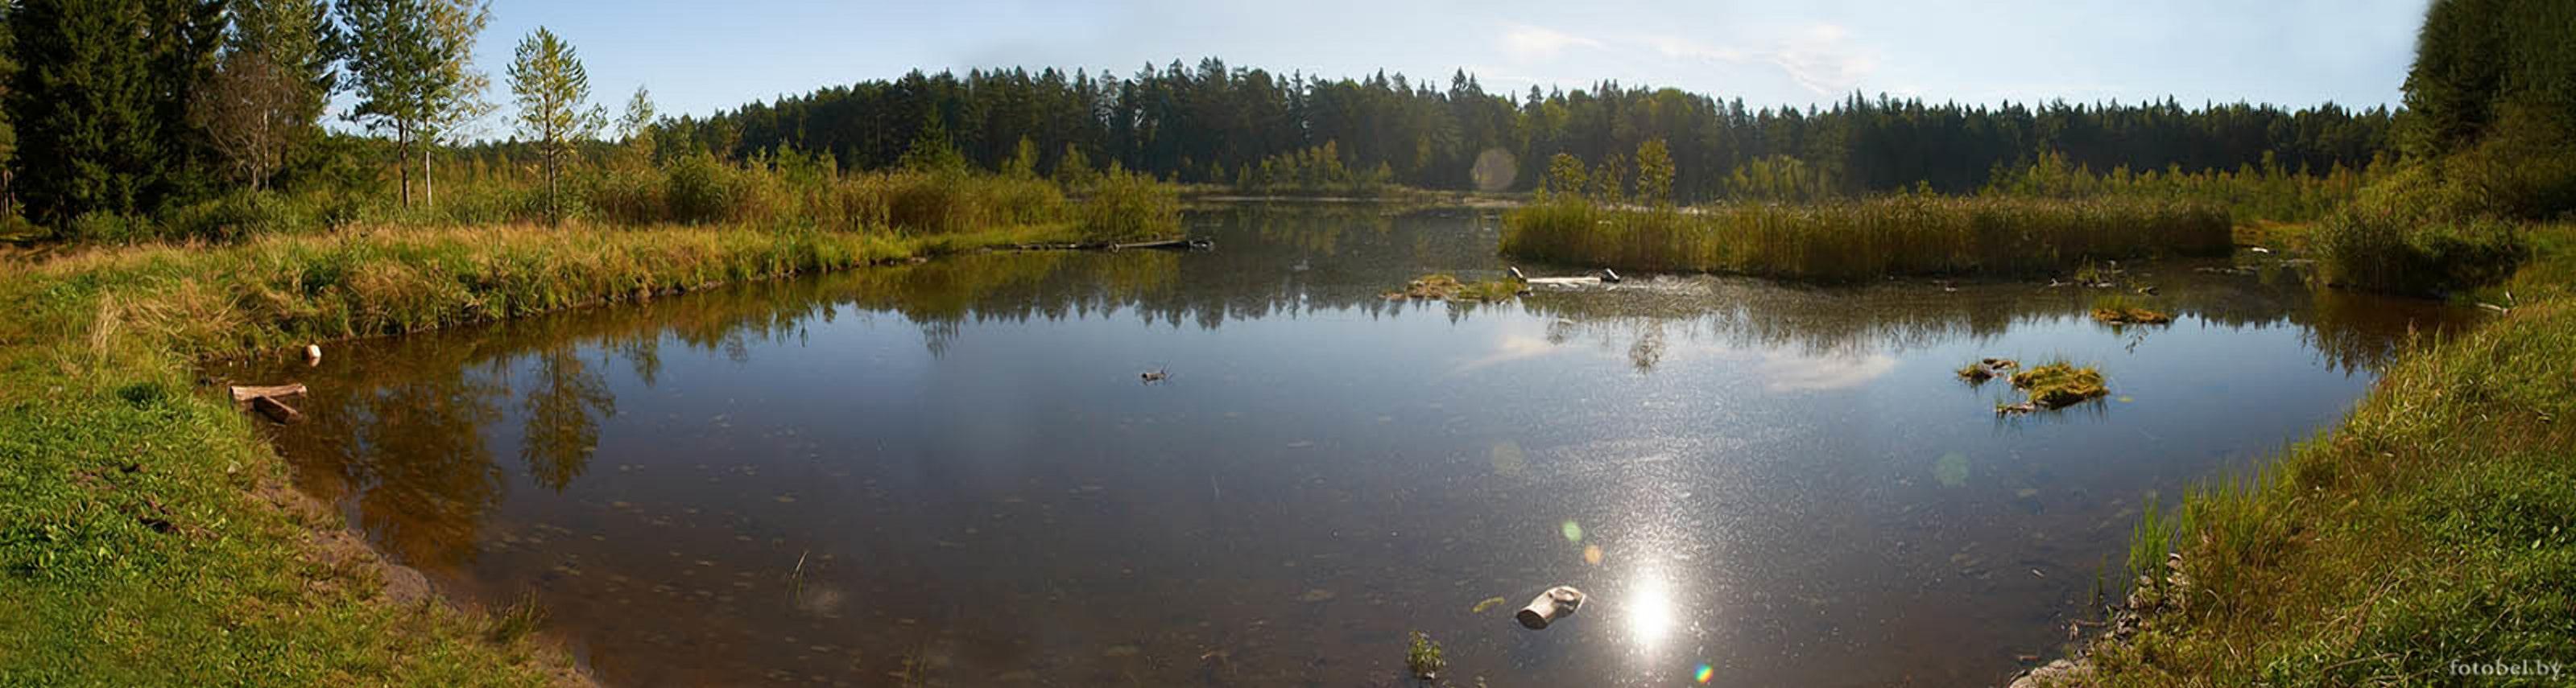 Озеро Стоячее